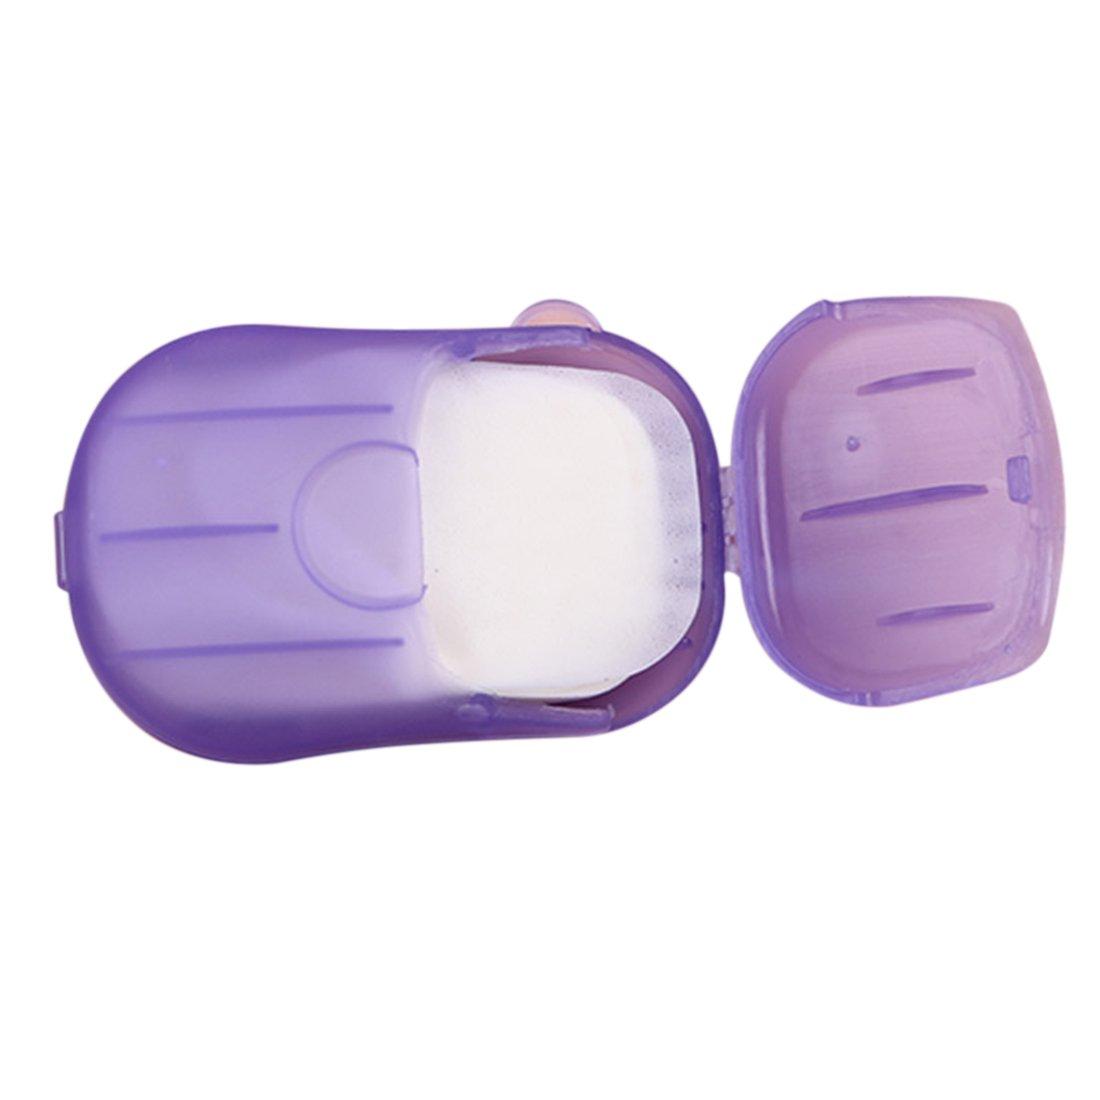 20piezas portátil papel jabón jabón hojas–Color al azar Hisuper-Store